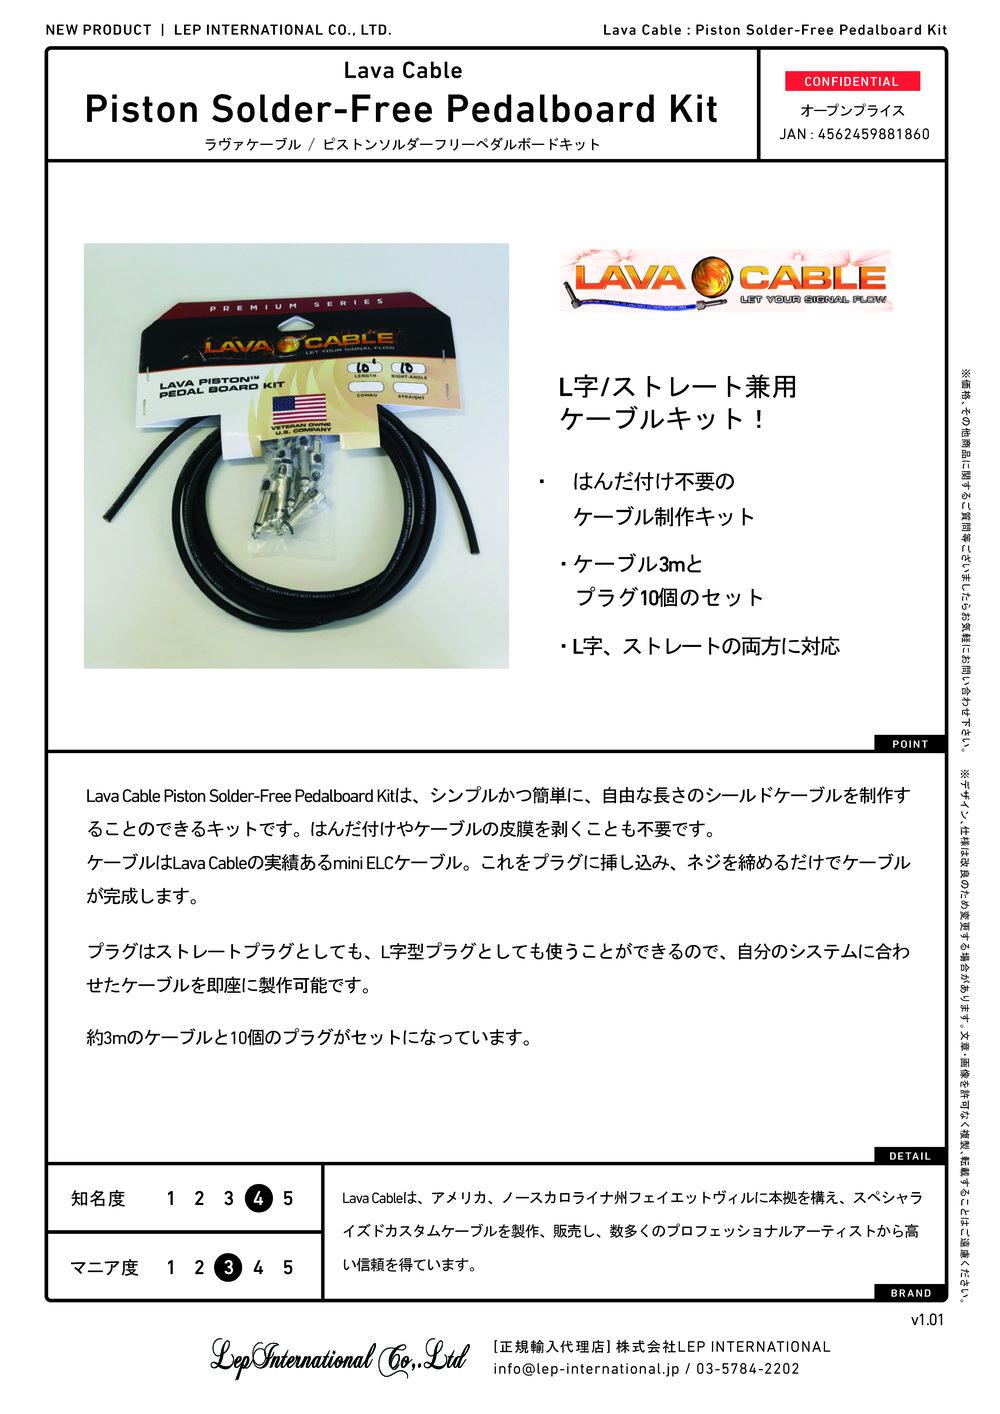 lavacable pistonsolder-freepedalboardkit v1.01.jpg